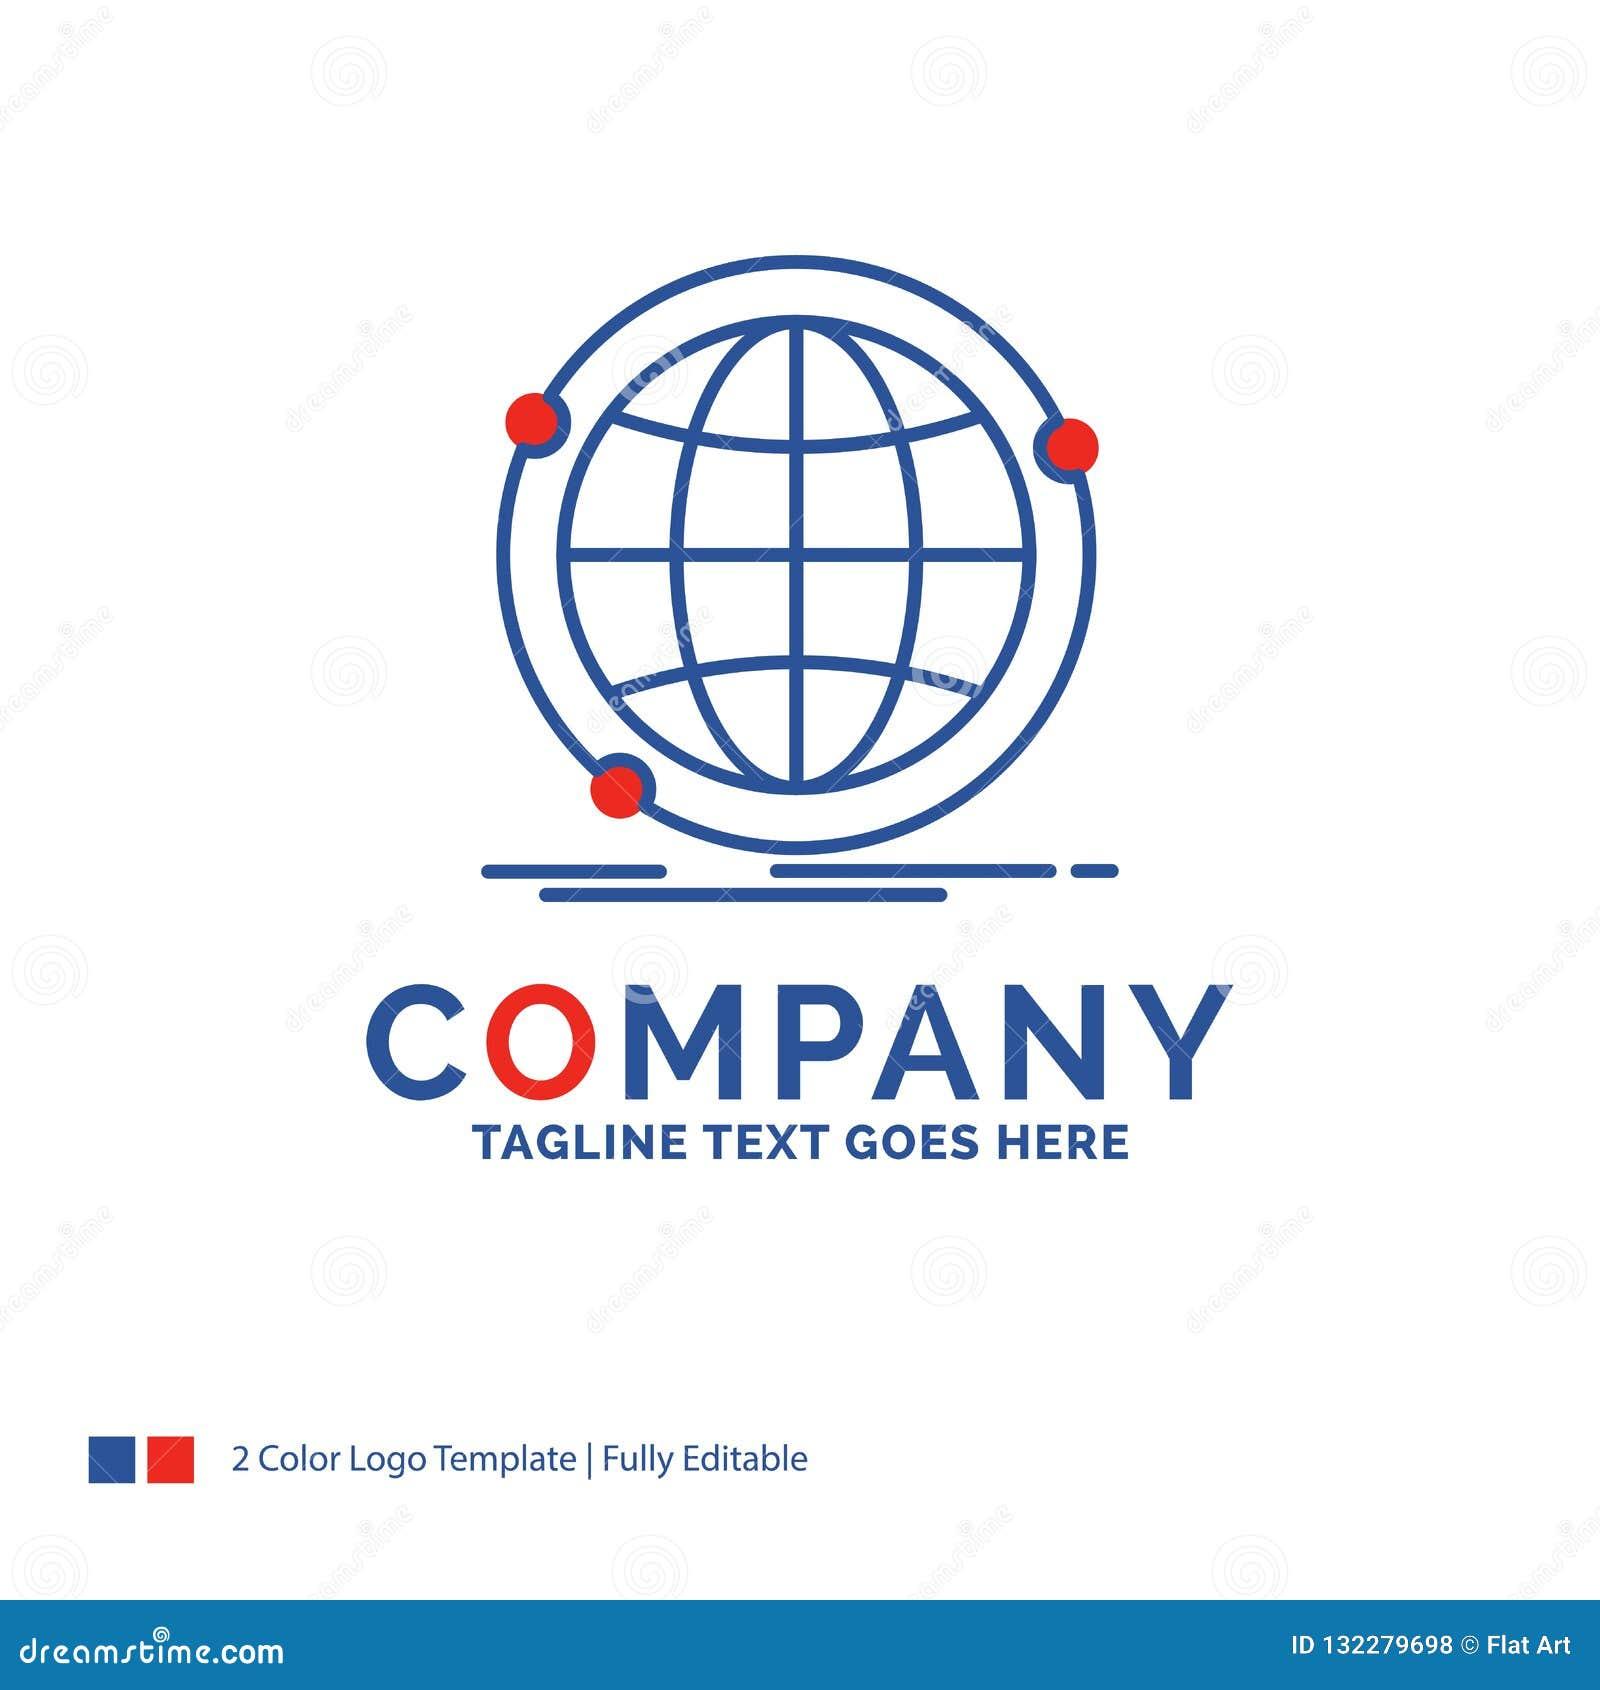 Company Name Logo Design For Data, Global, Internet